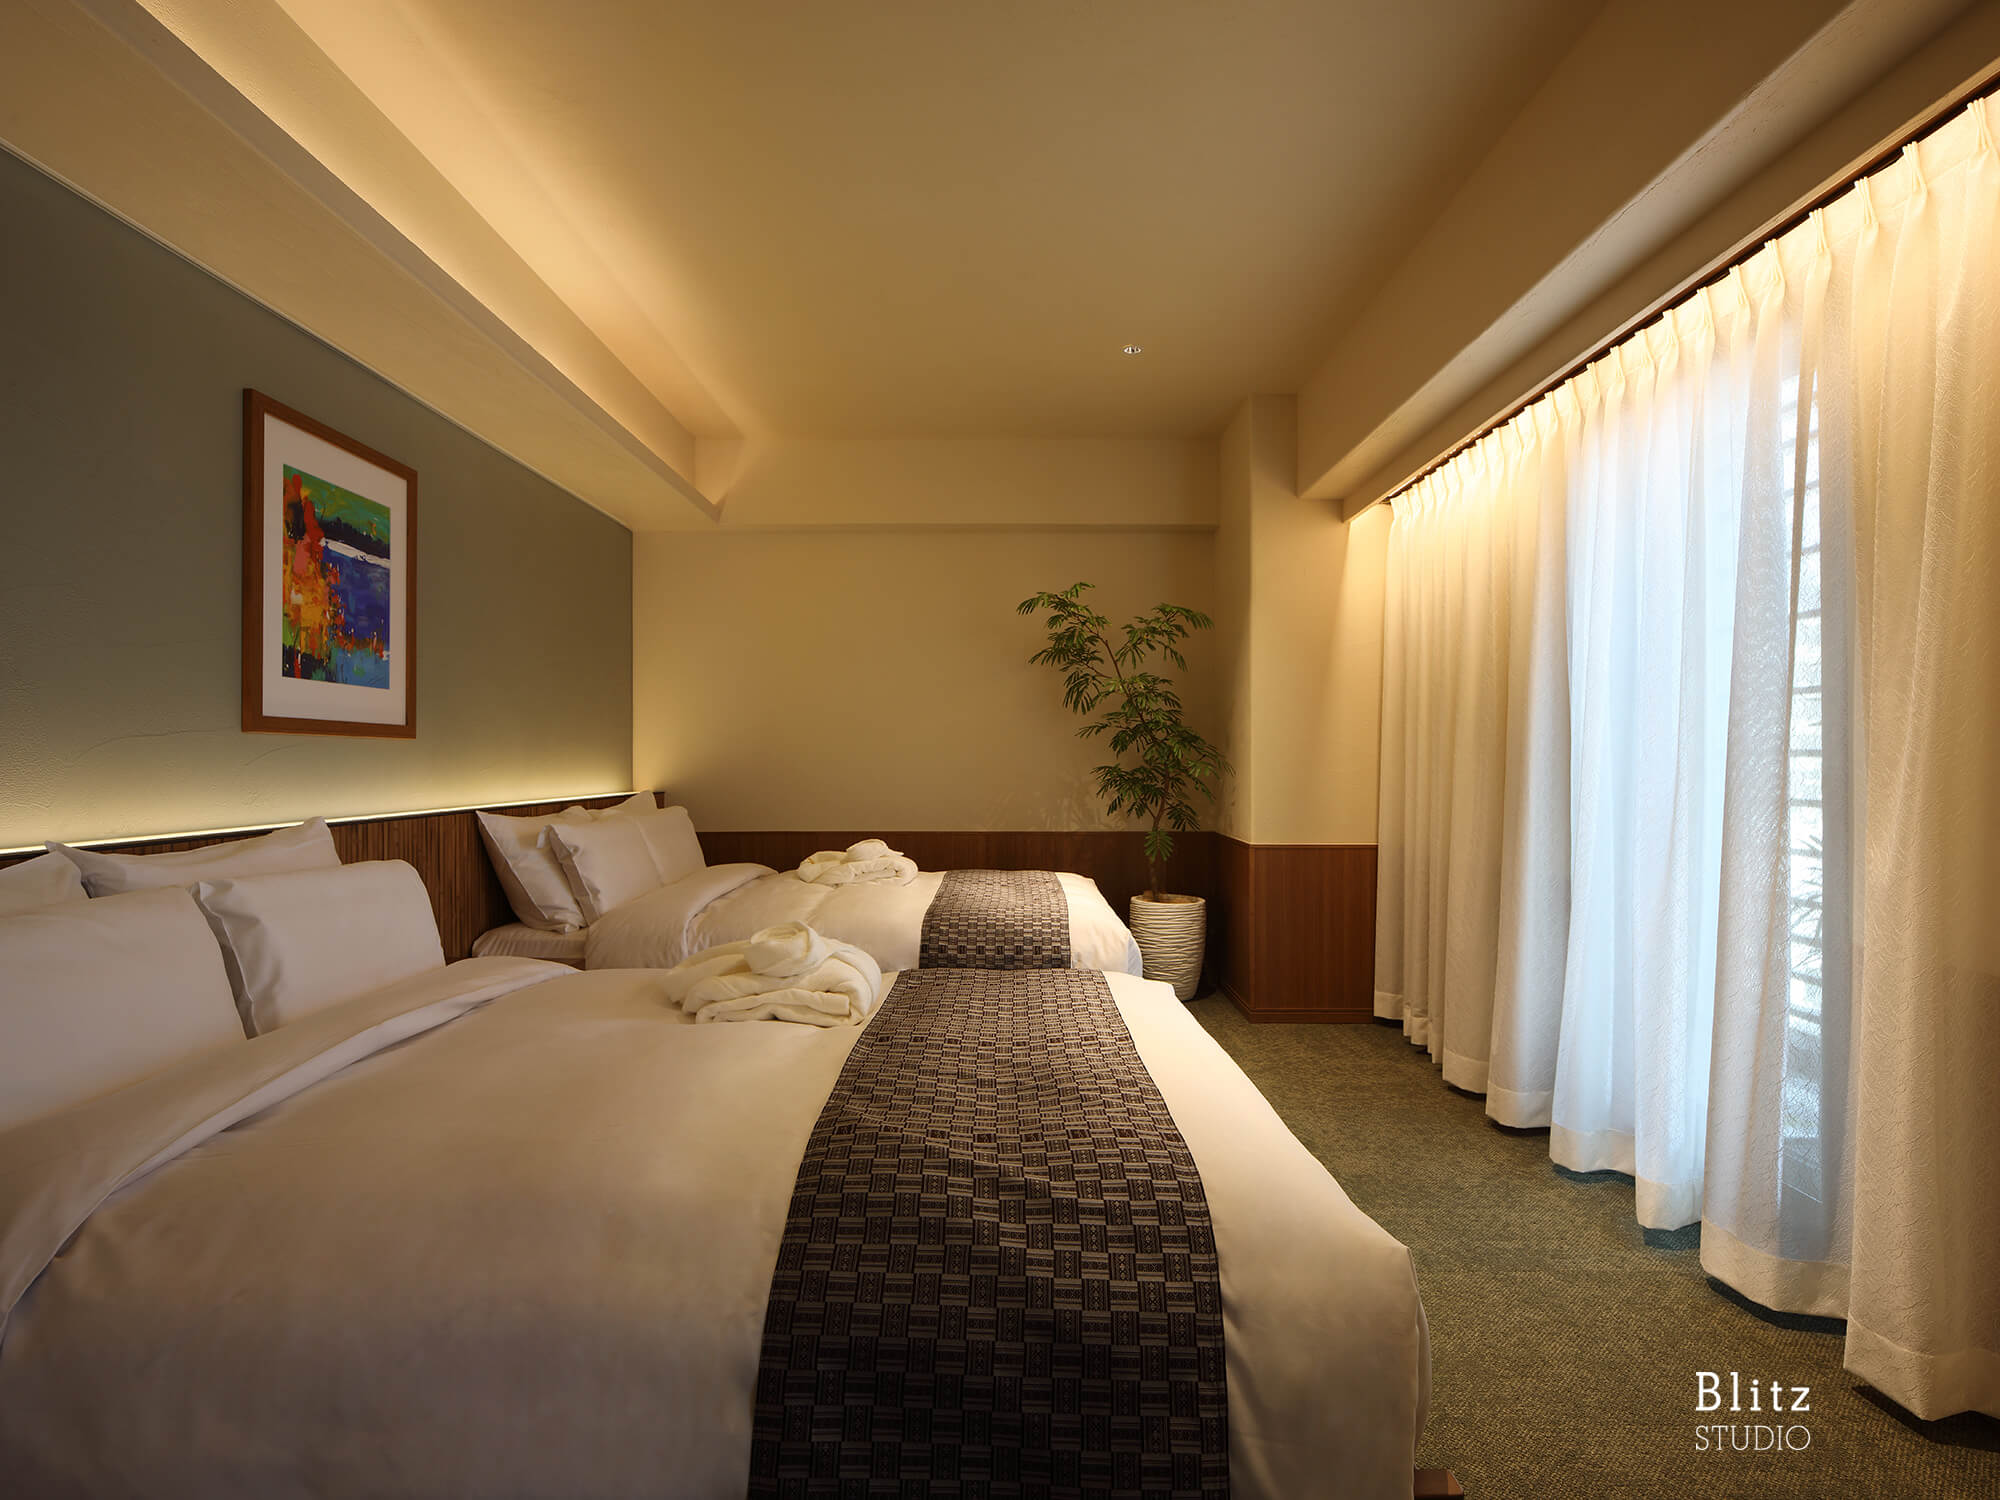 『HOTEL GREAT MORNING』建築写真・竣工写真・インテリア写真14